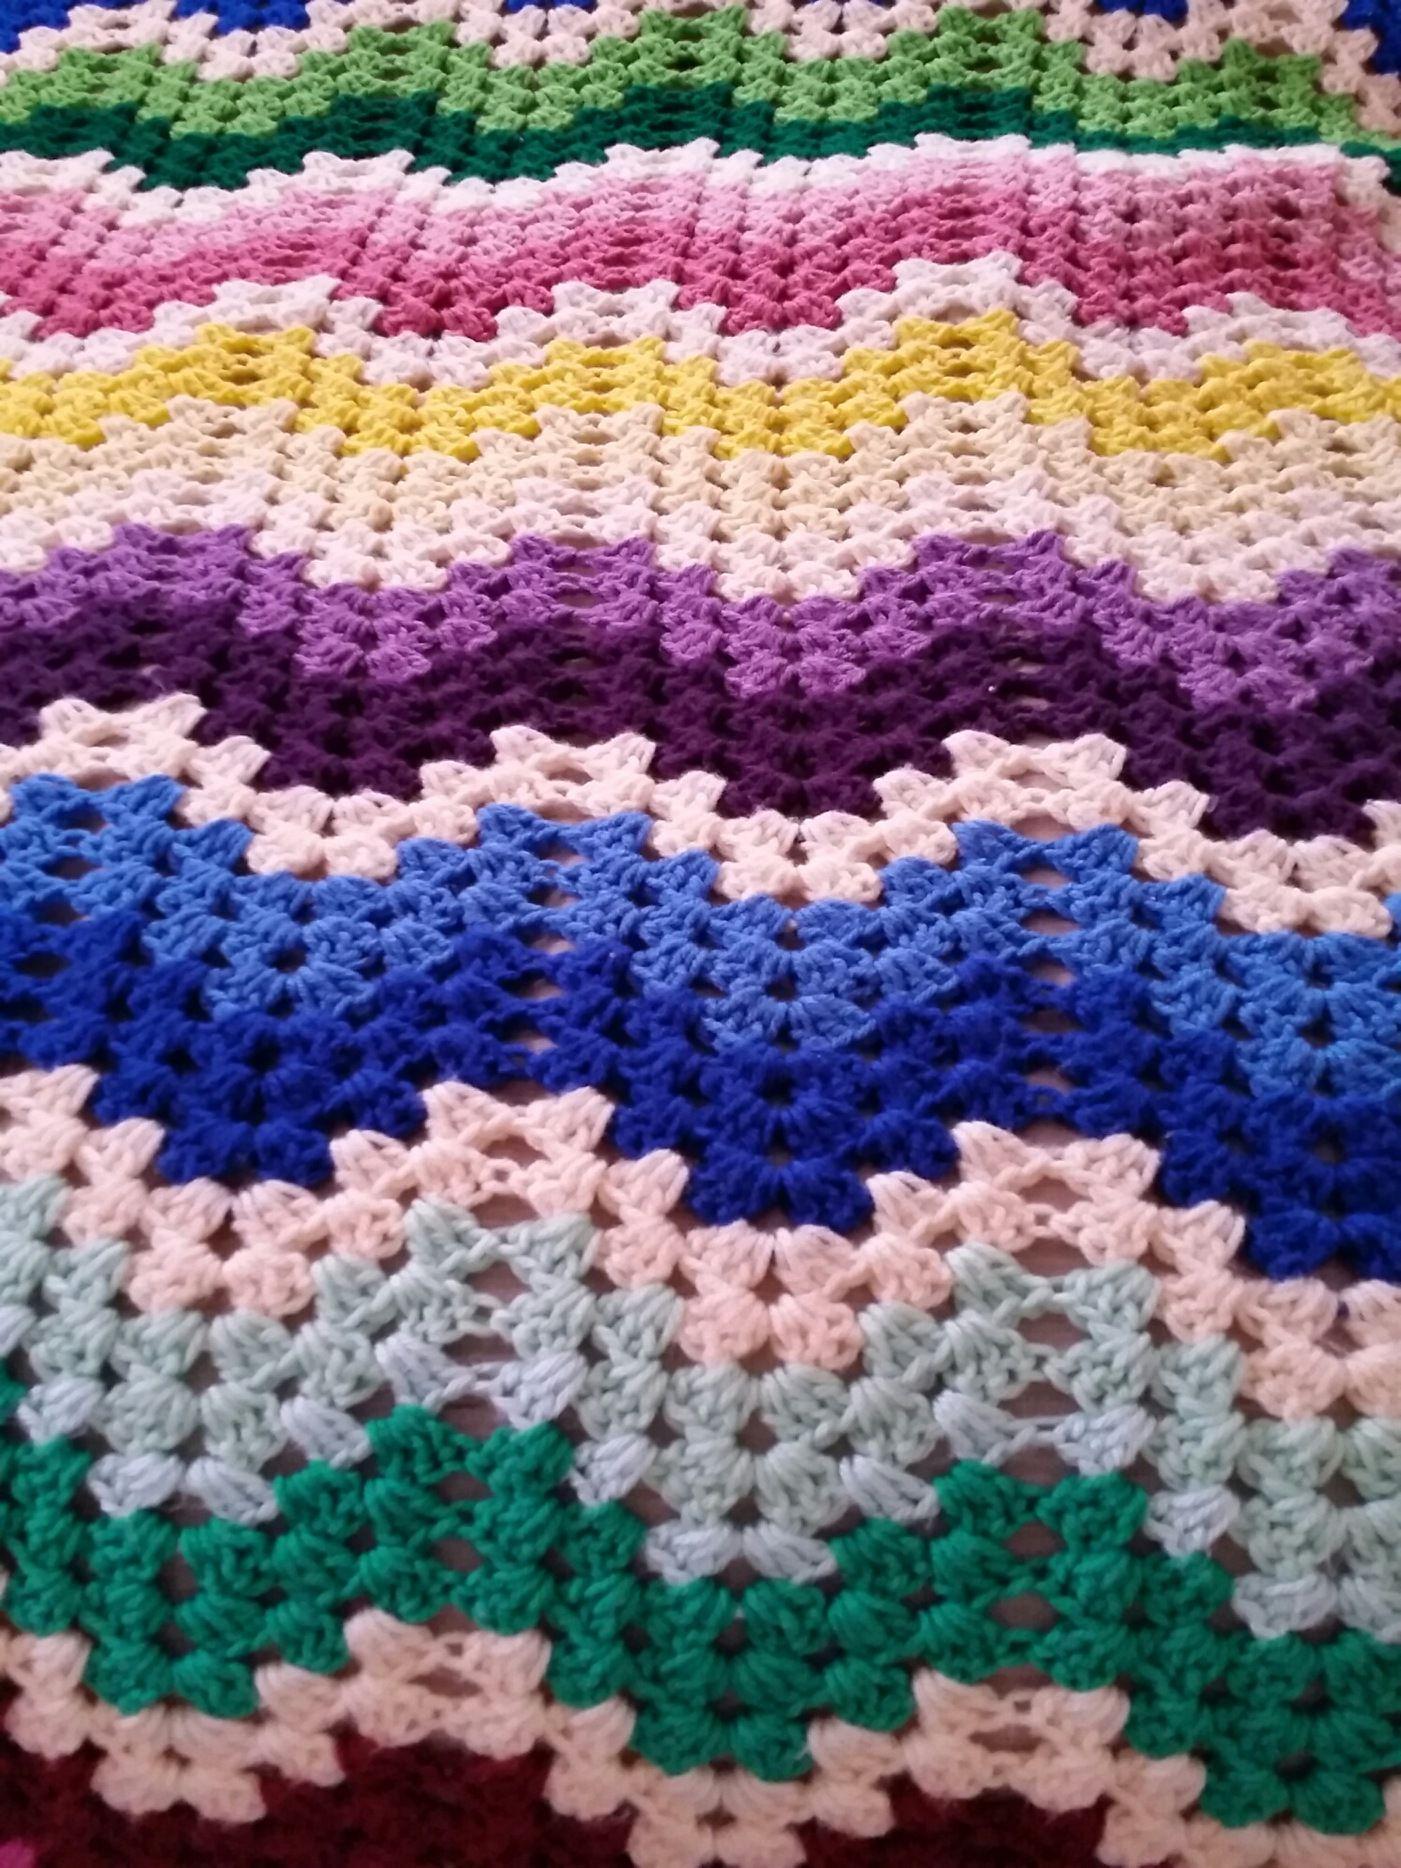 Granny ripple afghan | crochet afghan pattern and more | Pinterest ...